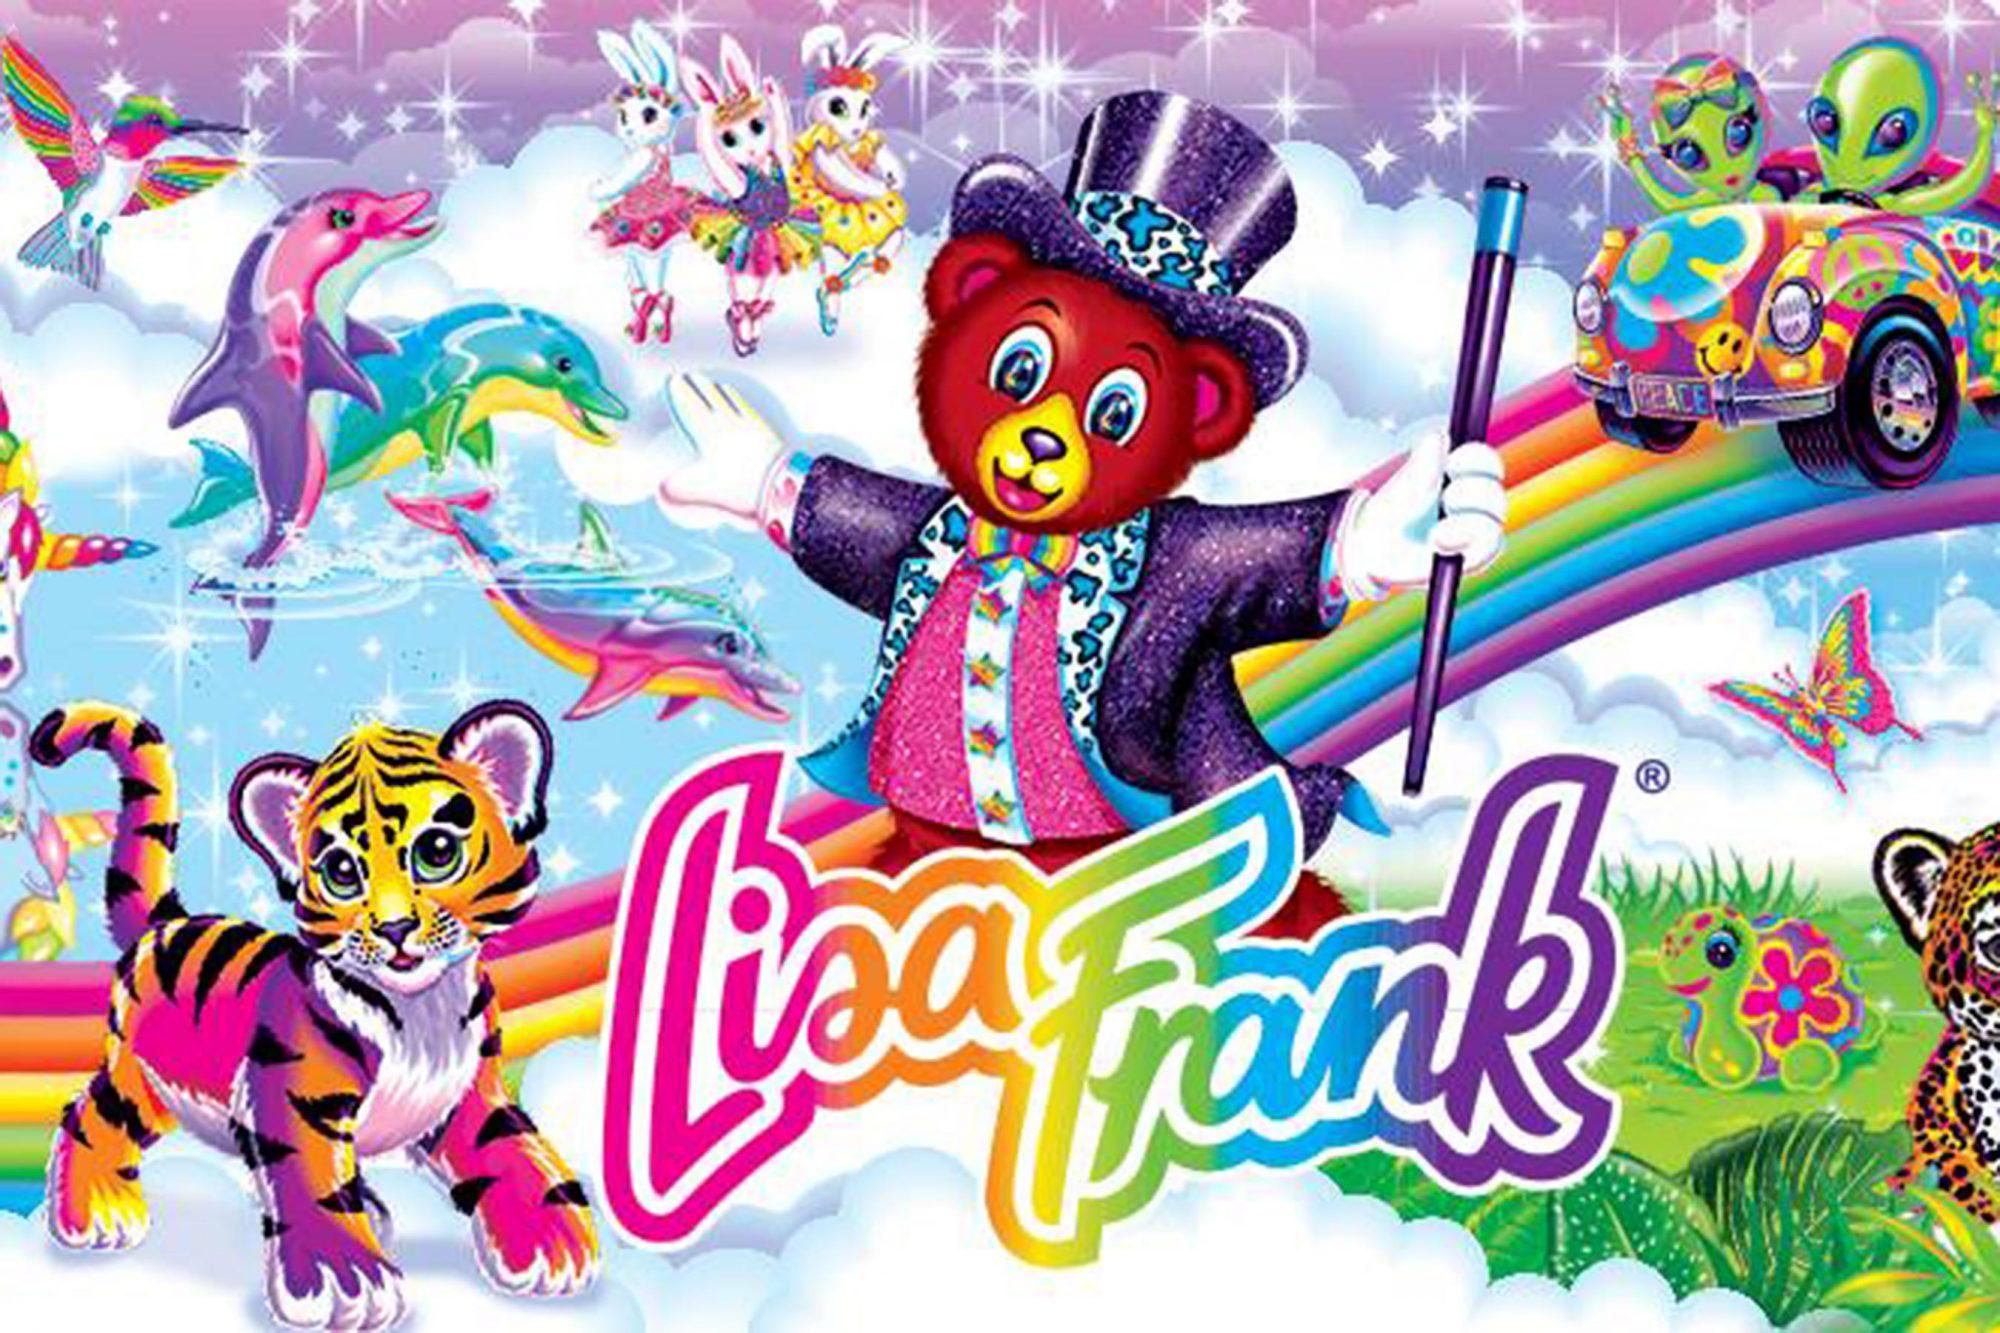 Lisa Frank Logo CR: Lisa Frank